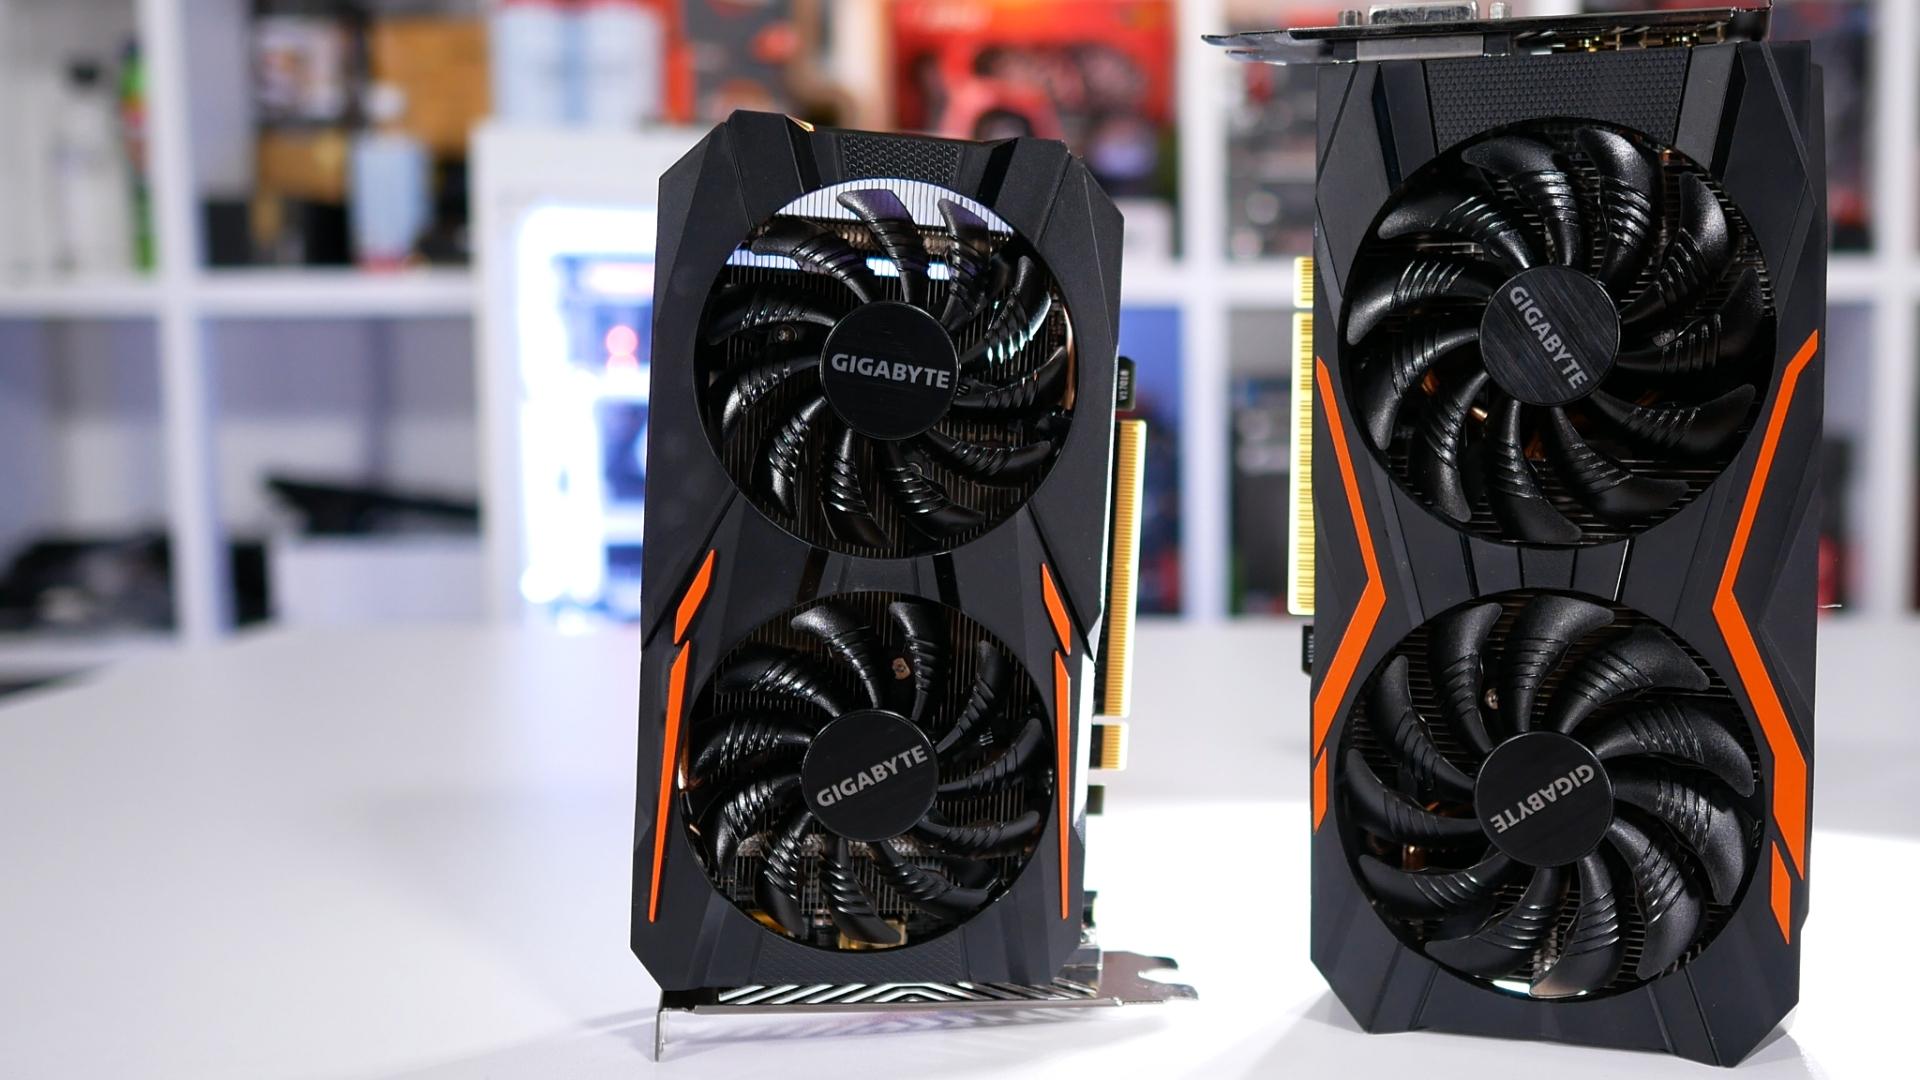 The Best $100 Entry-Level GPU: Radeon RX 560 vs  GeForce GTX